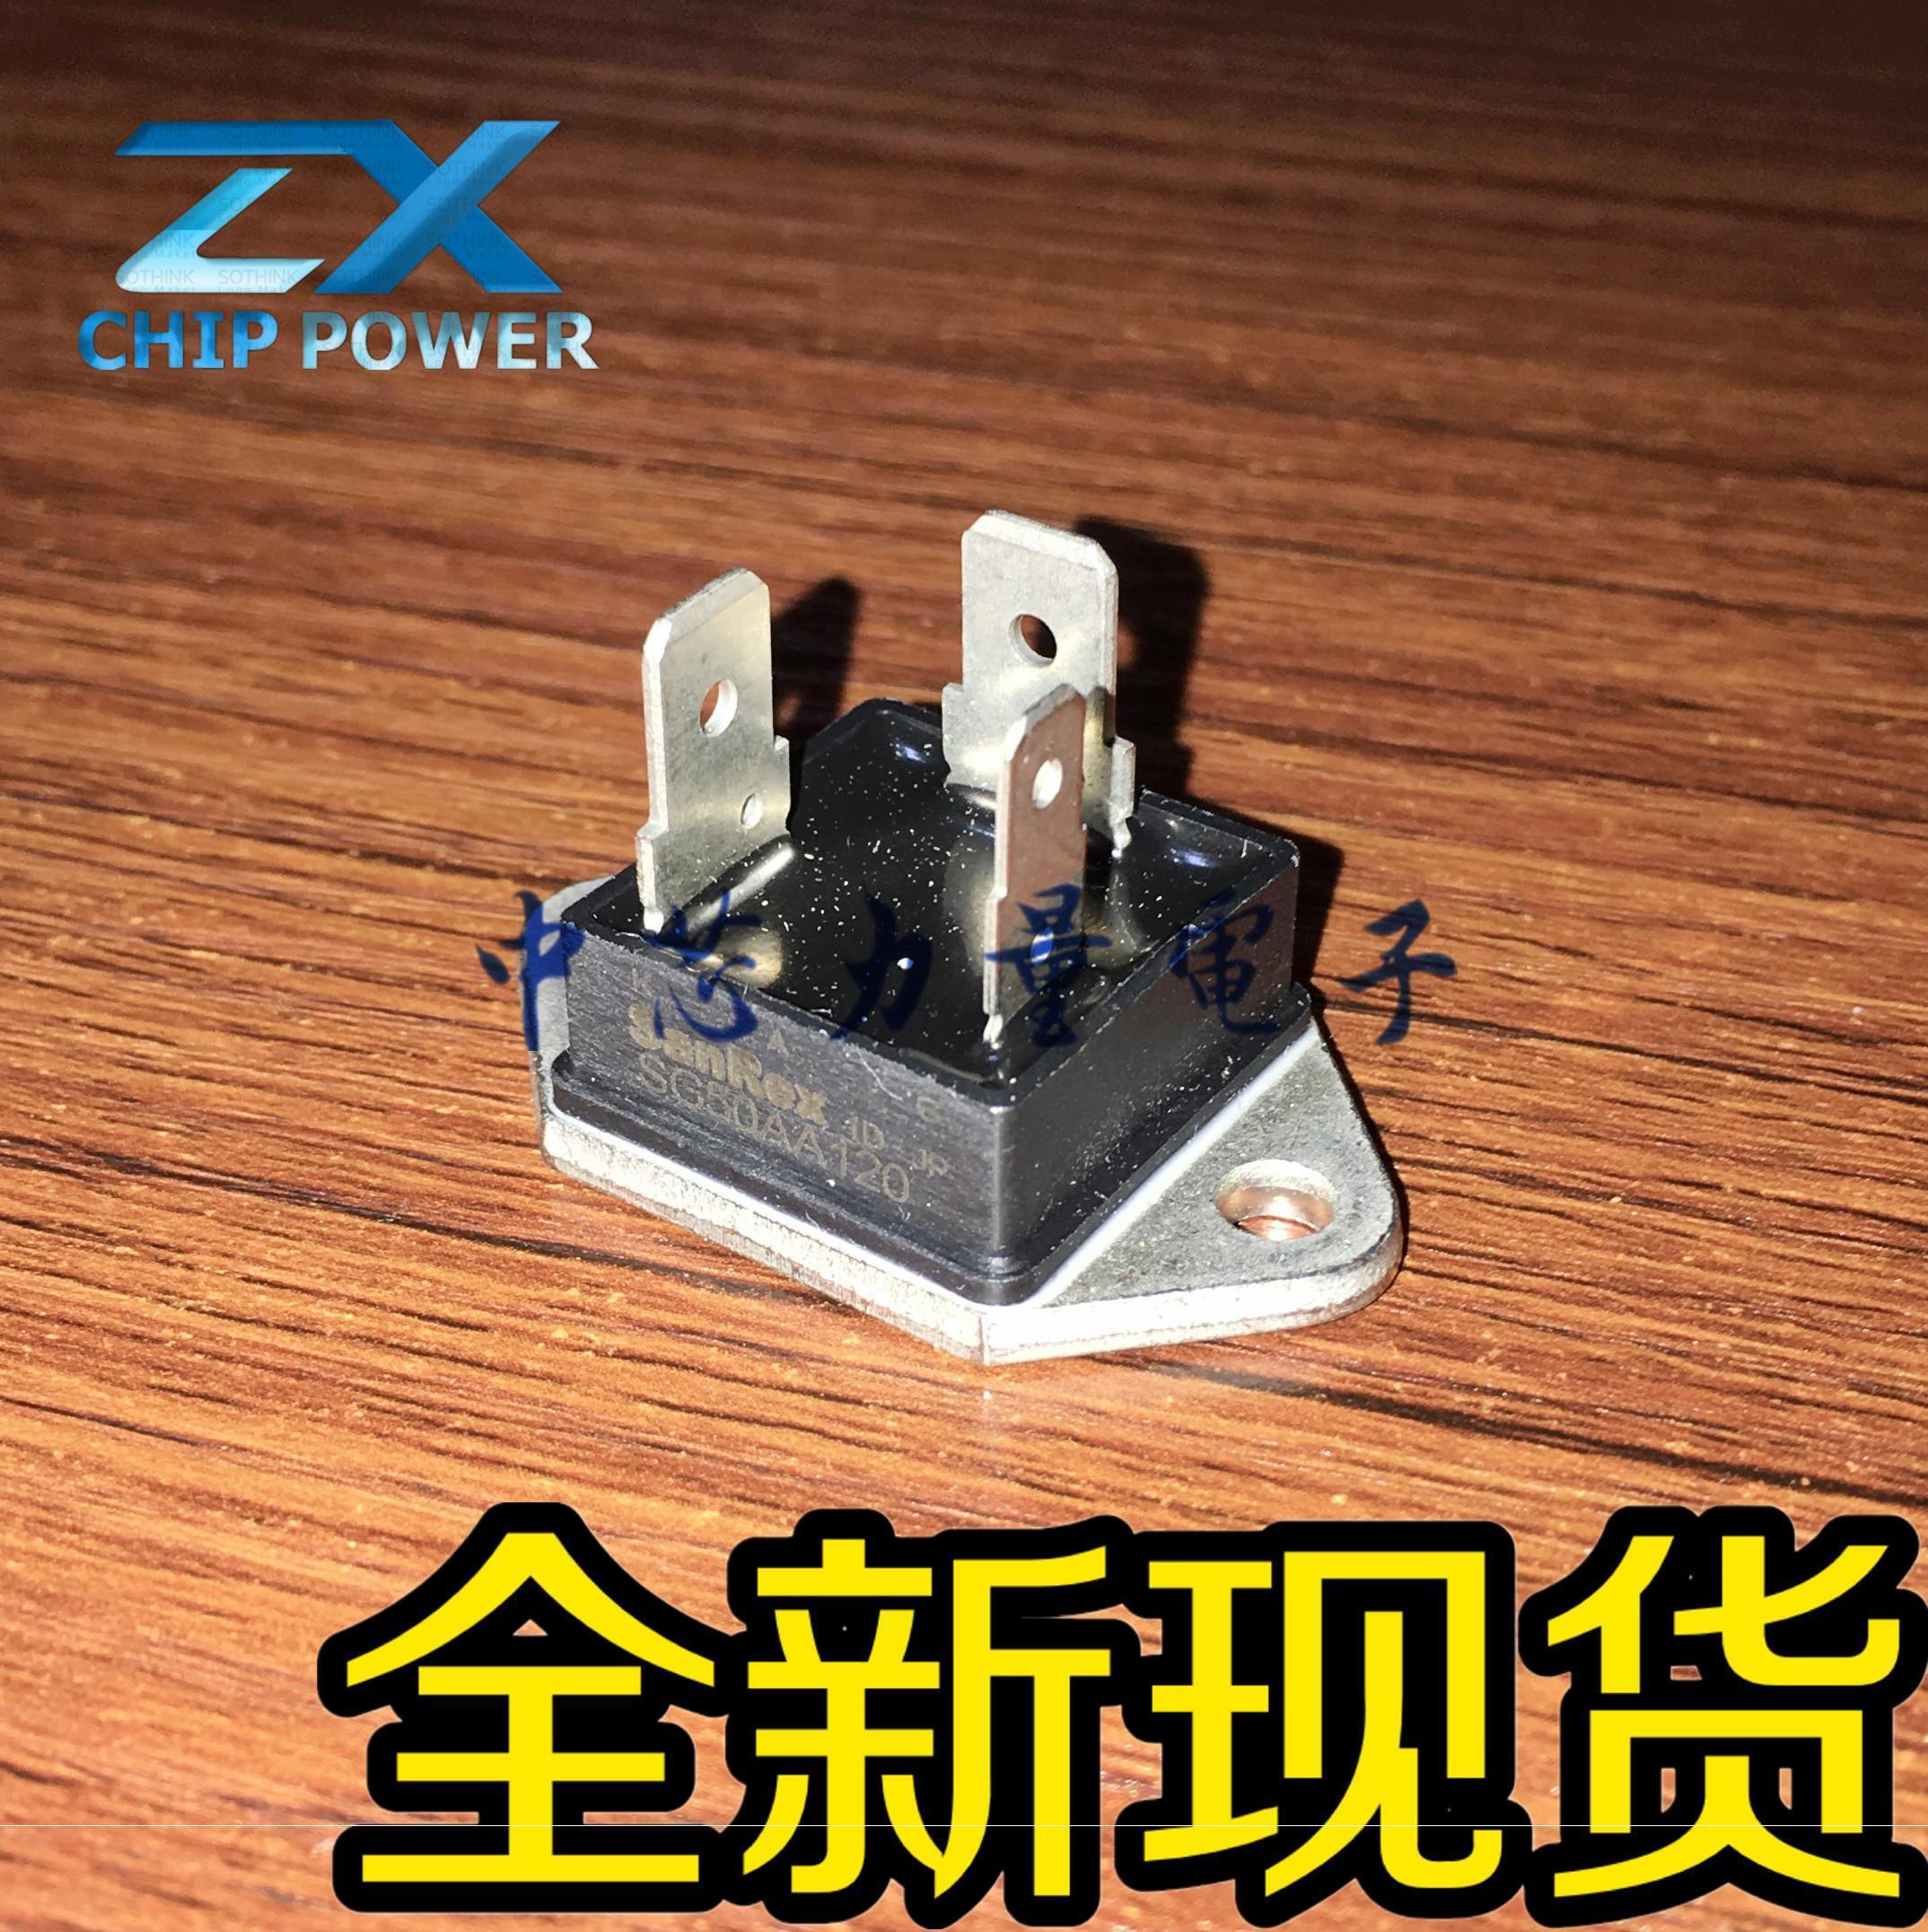 SG50AA120 50A 1200V 可控硅SG50AA60 SG25AA60 SG25AA120 全新